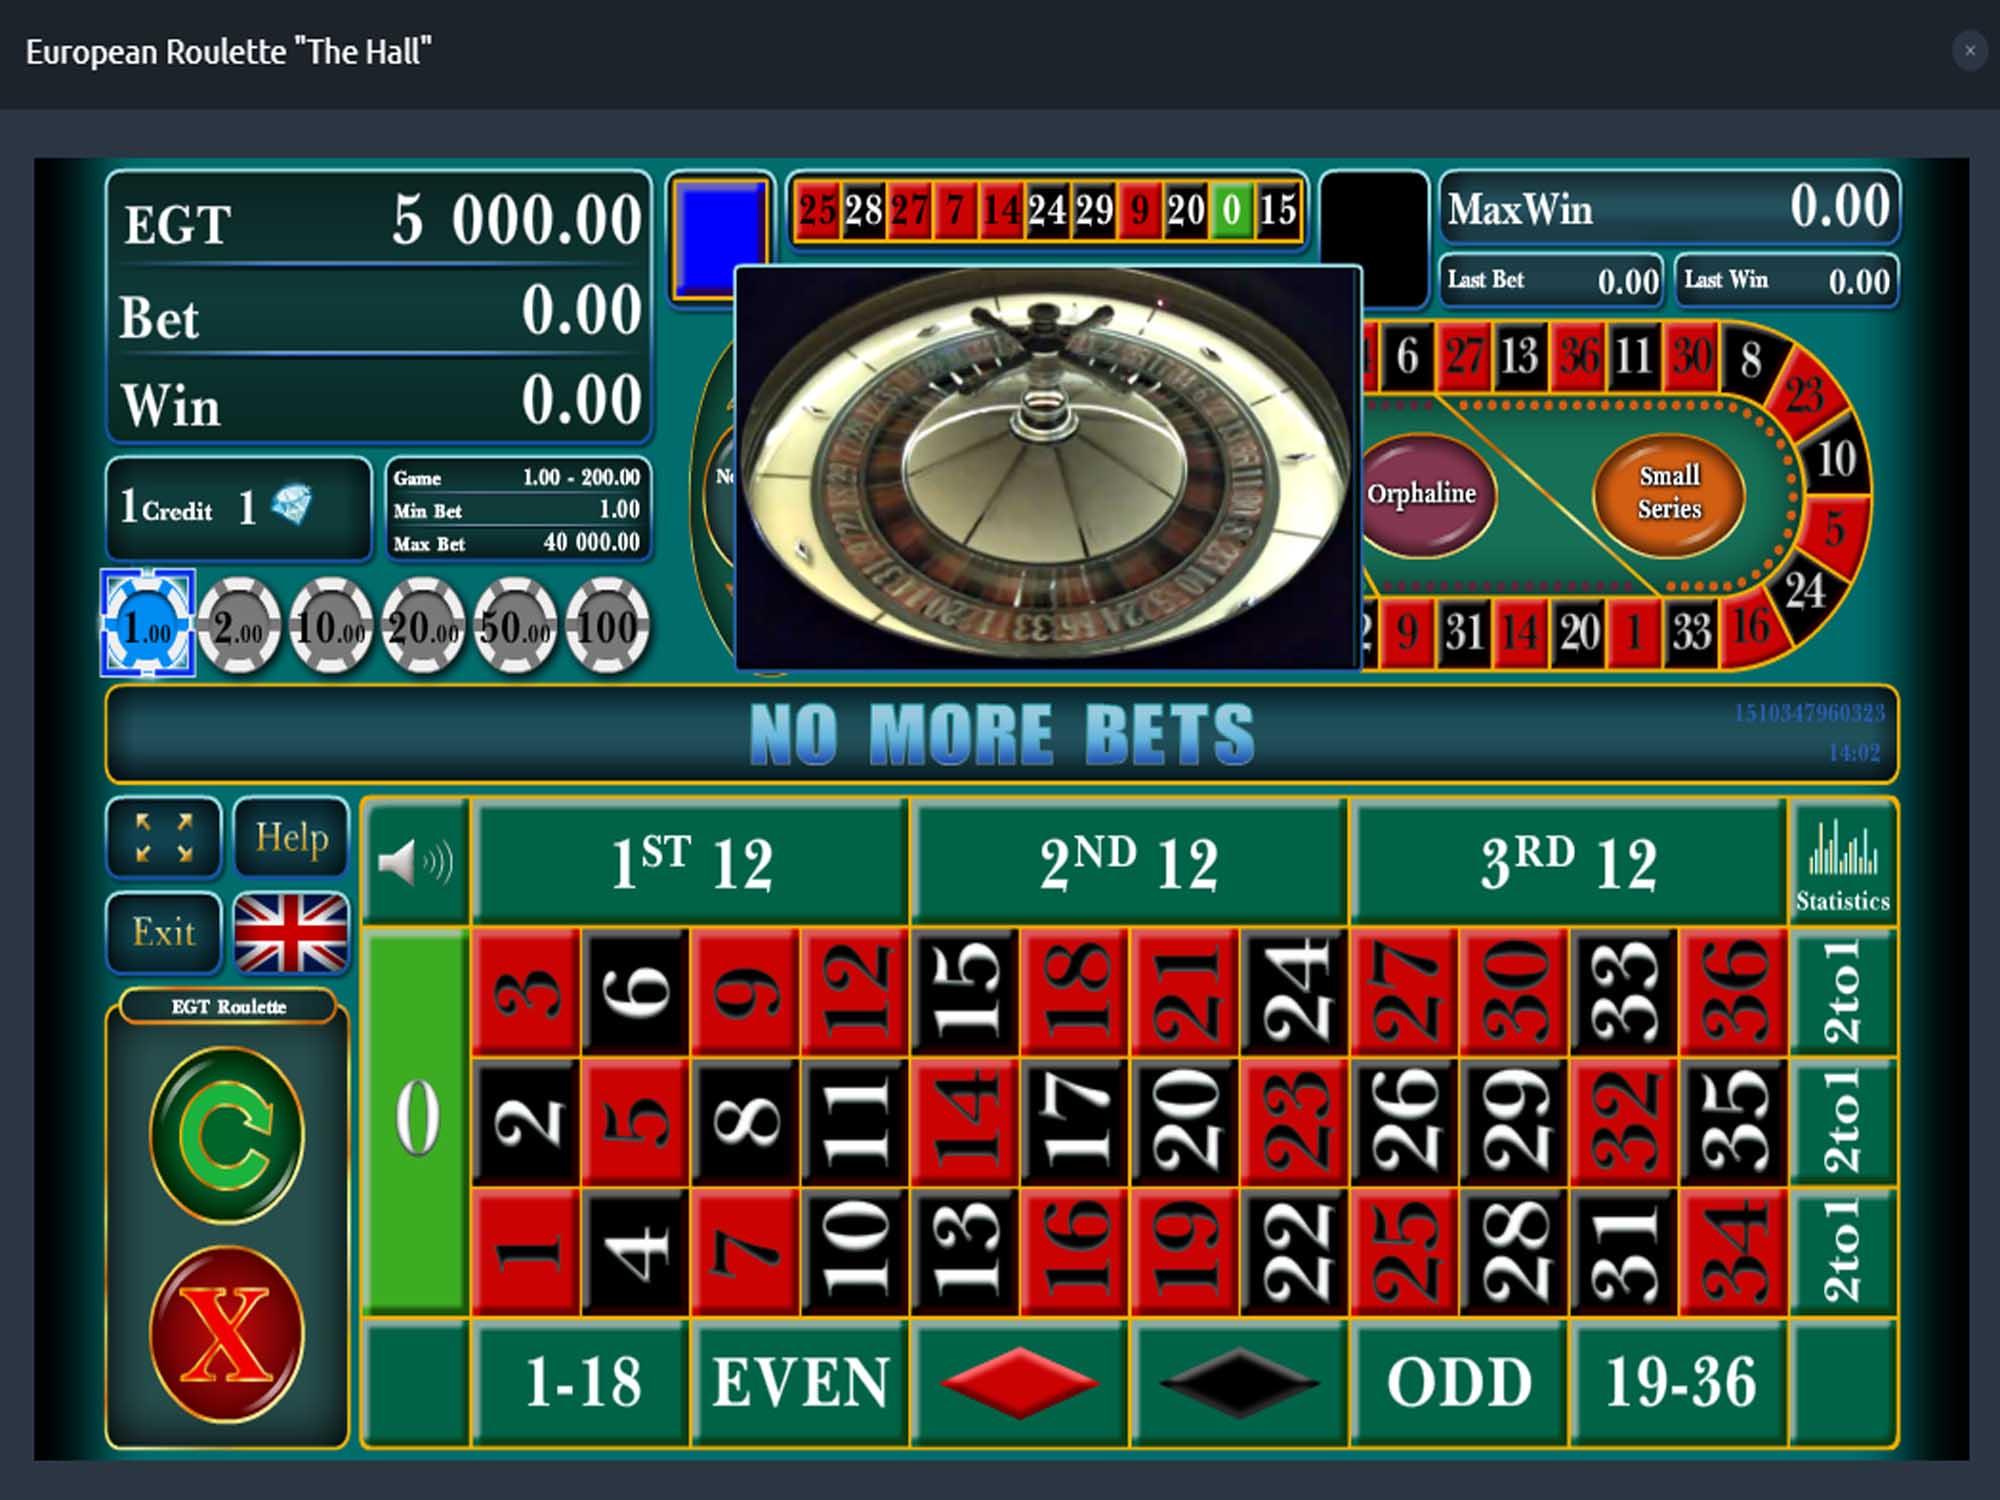 EGT European Roulette screenshot